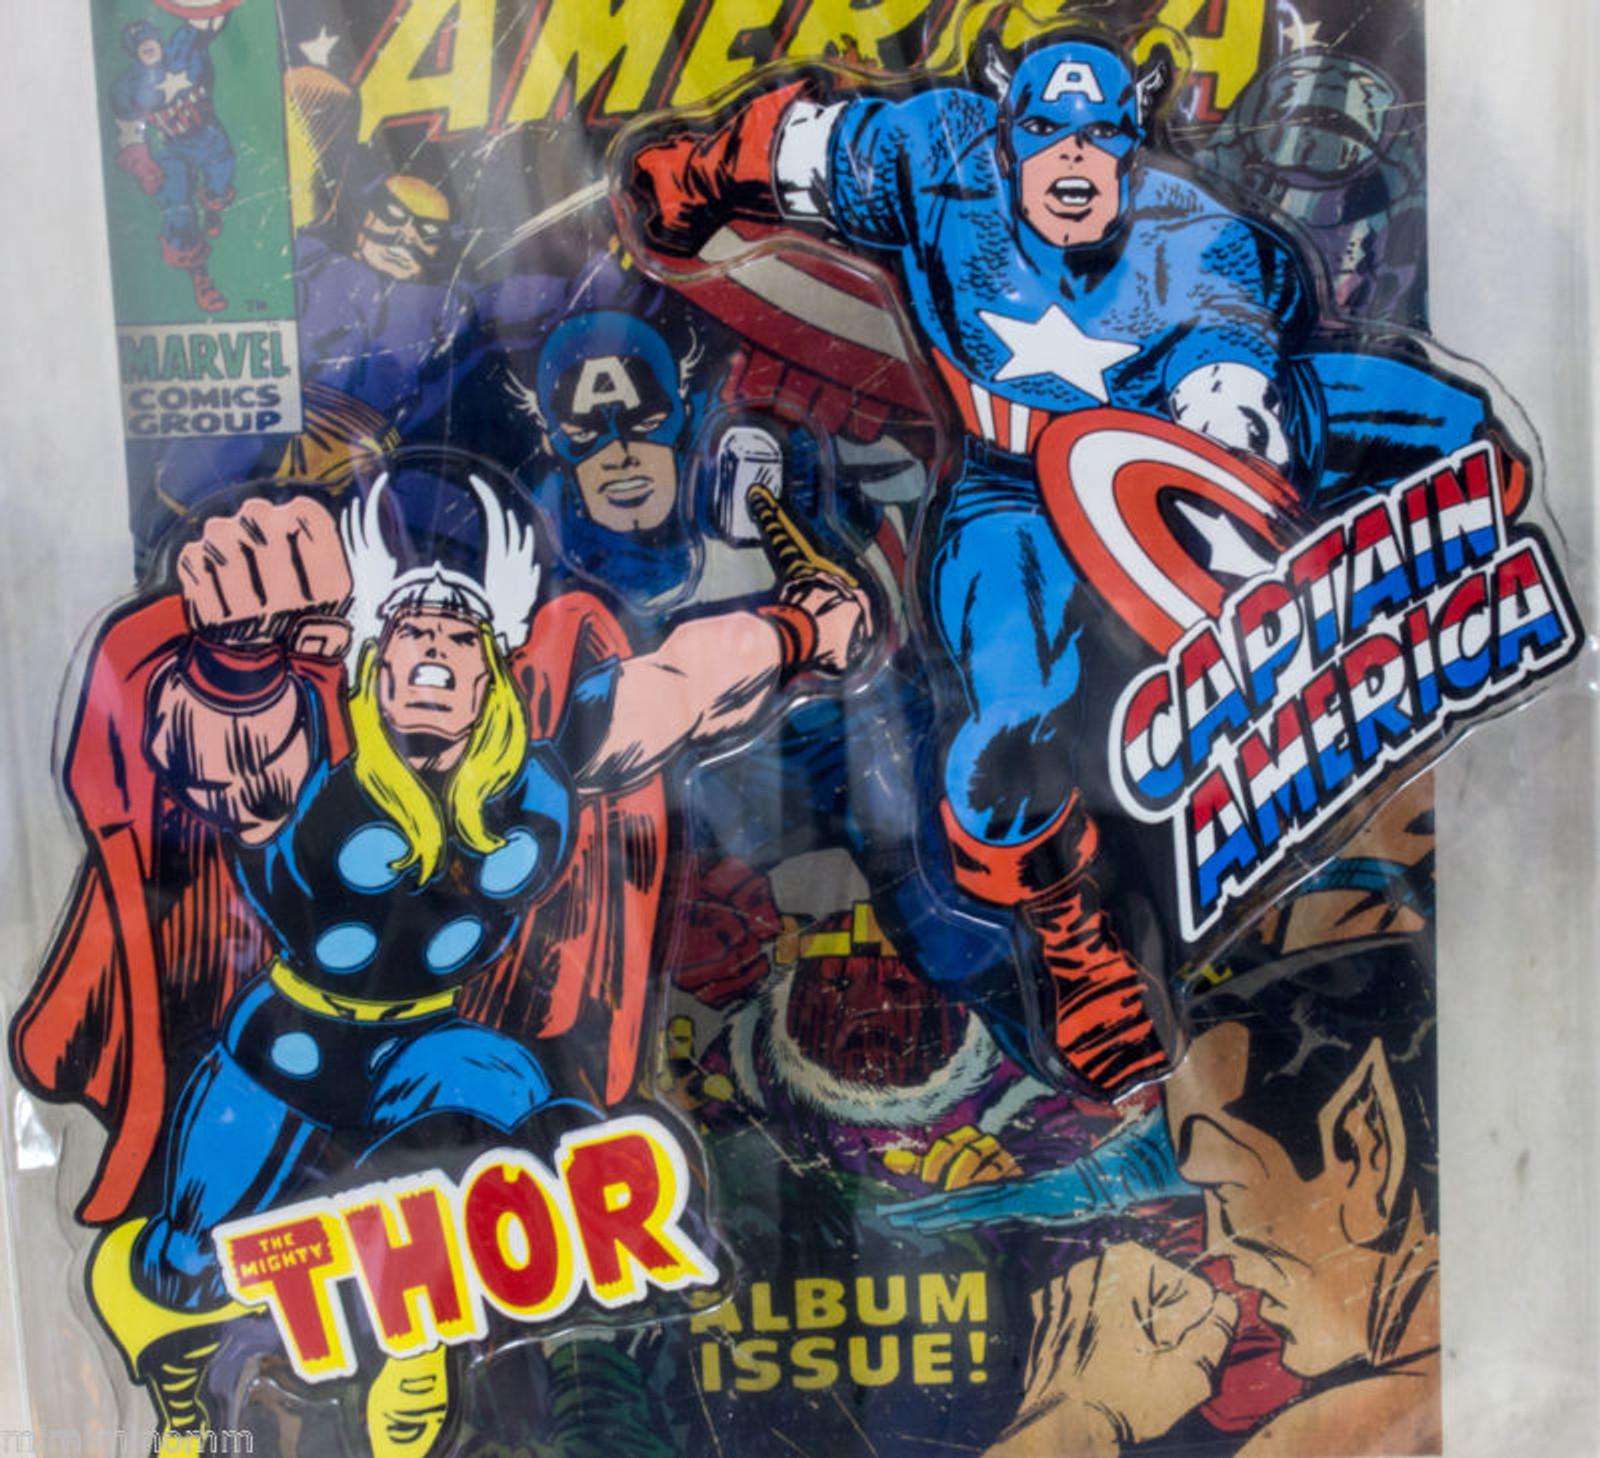 Marvel Rubber Magnet Captain America & Mighty Thor Banpresto JAPAN ANIME COMICS